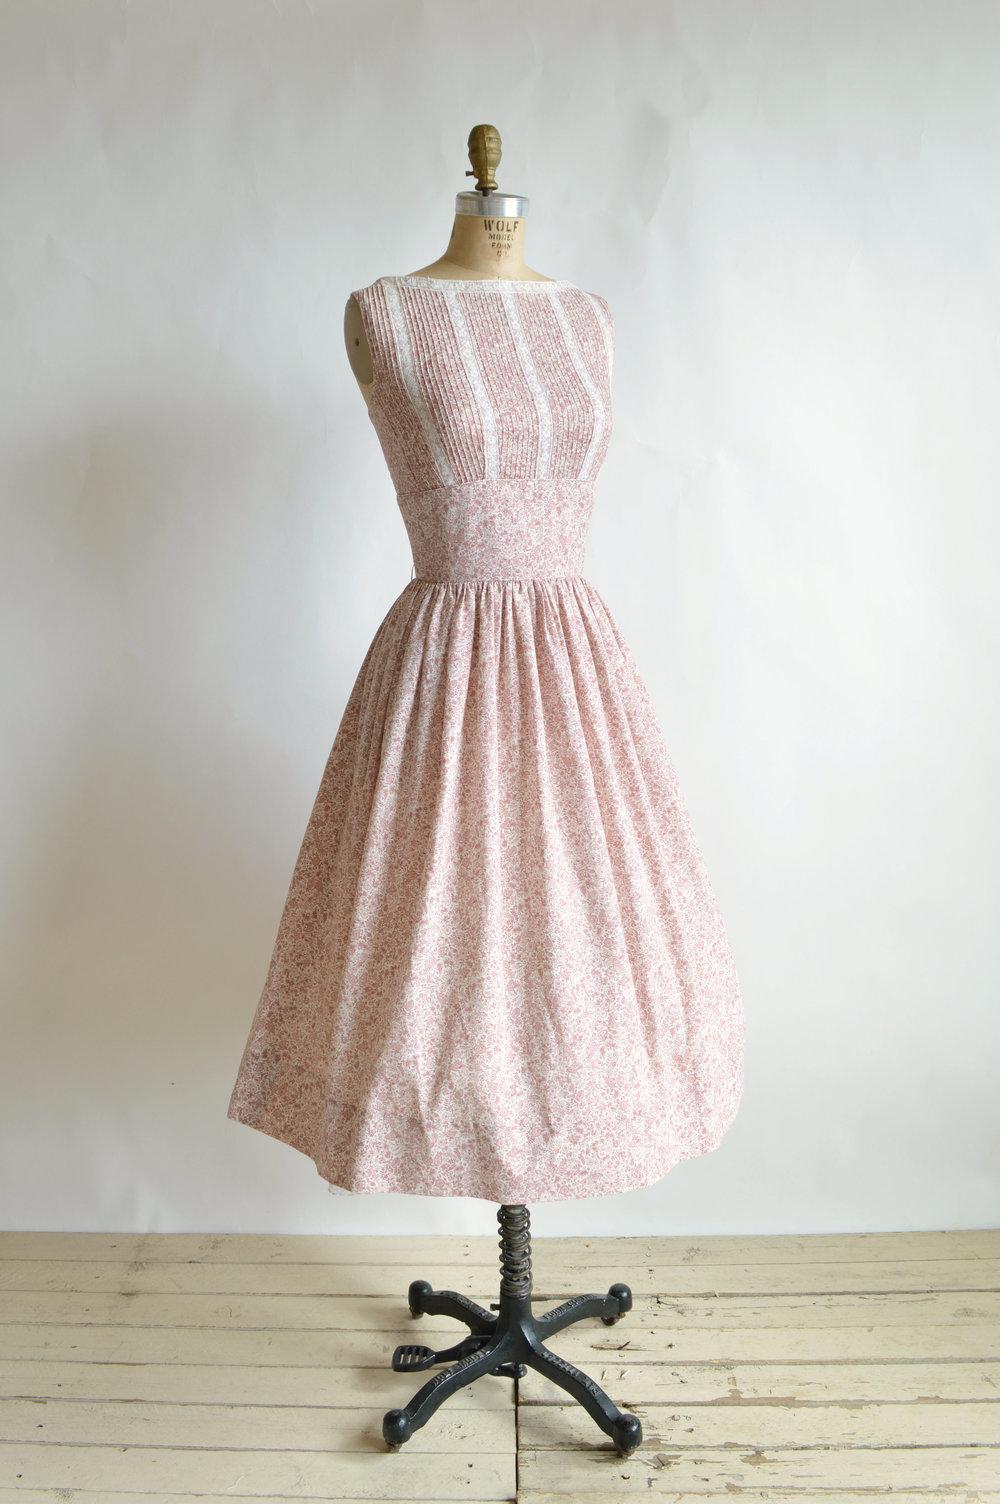 Vintage 1950s Floral Print Dress